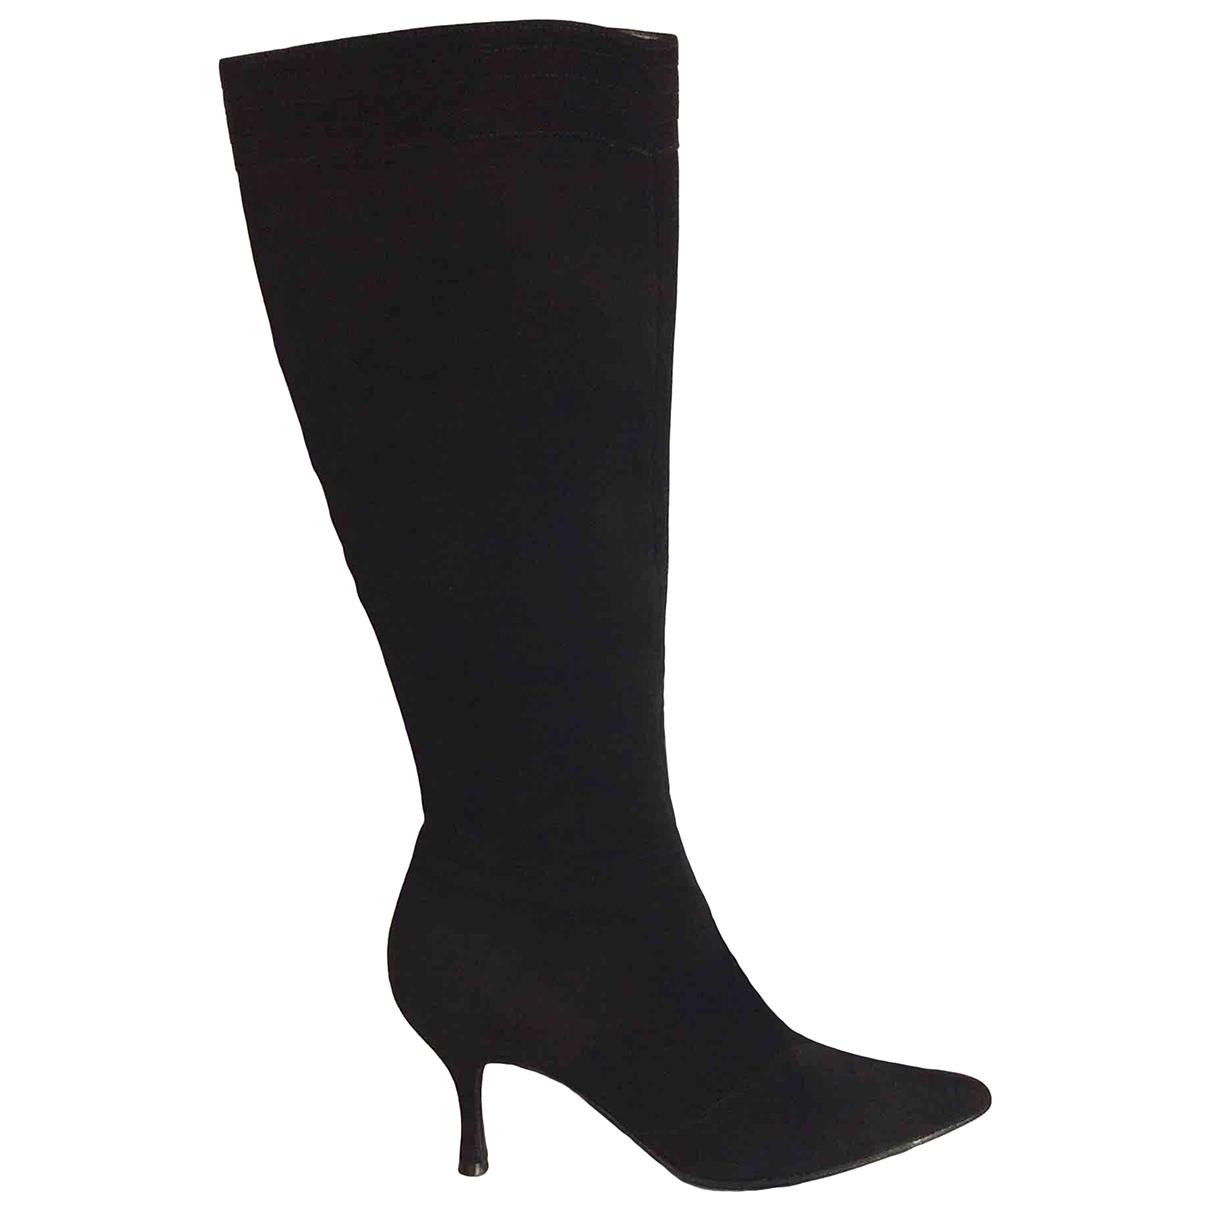 Salvatore Ferragamo \N Black Suede Boots for Women 7.5 US